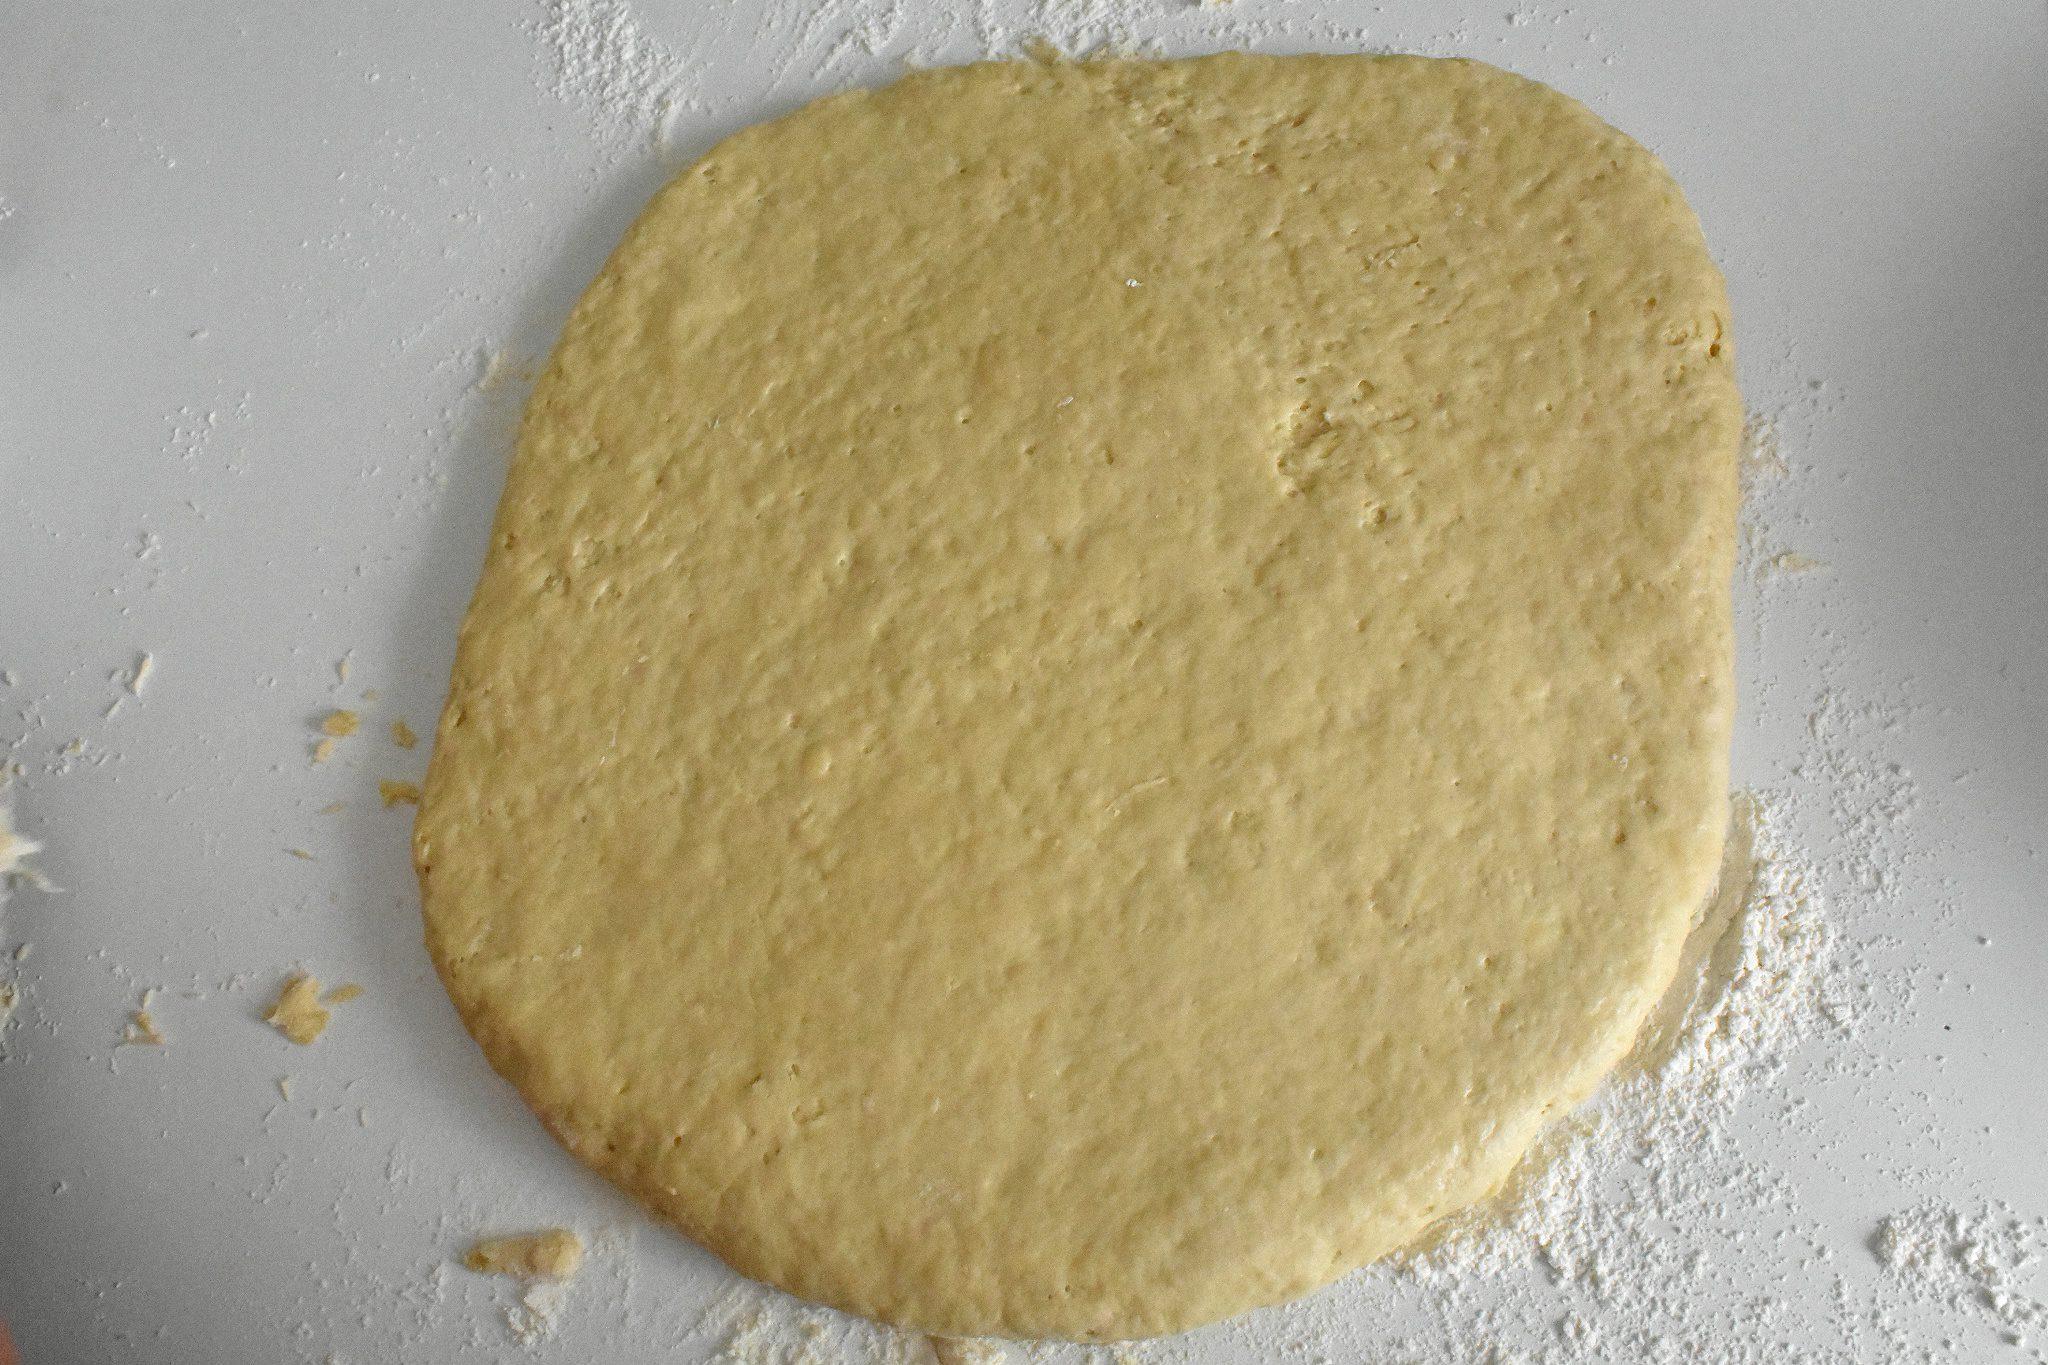 Homemade-healthy-donut-process-6-SunCakeMom